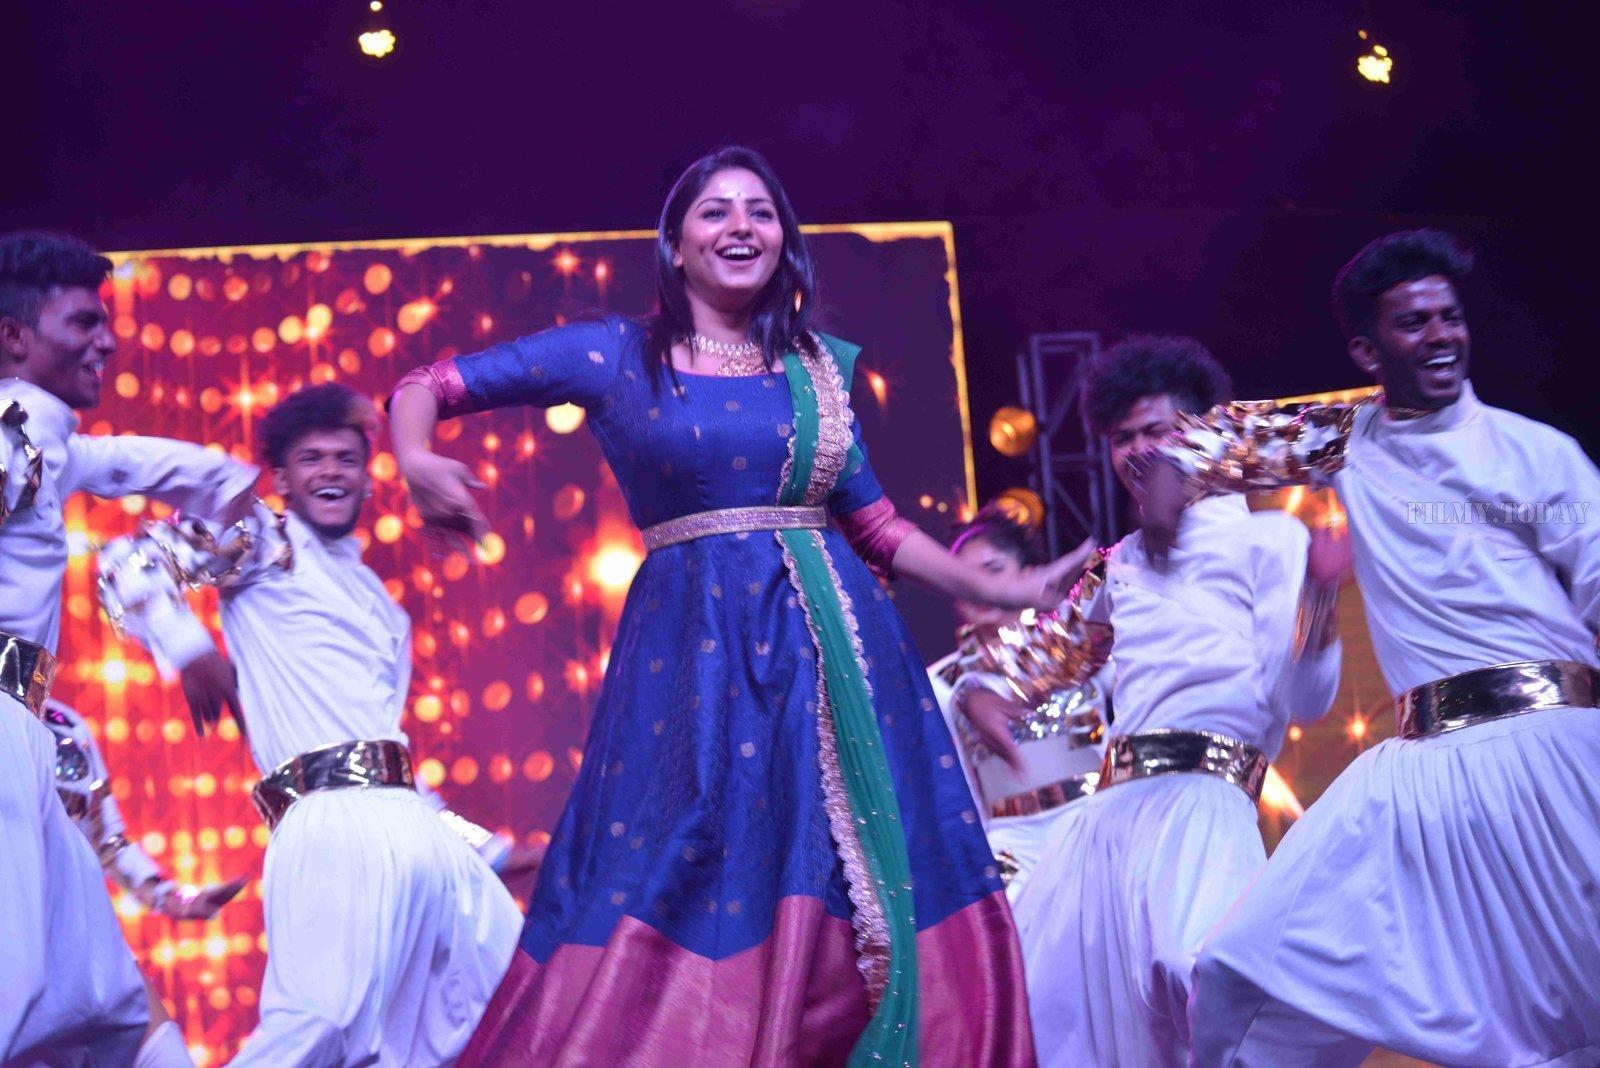 Picture 1561085   Pics: Actress Priya Banerjee Hot Photoshoot